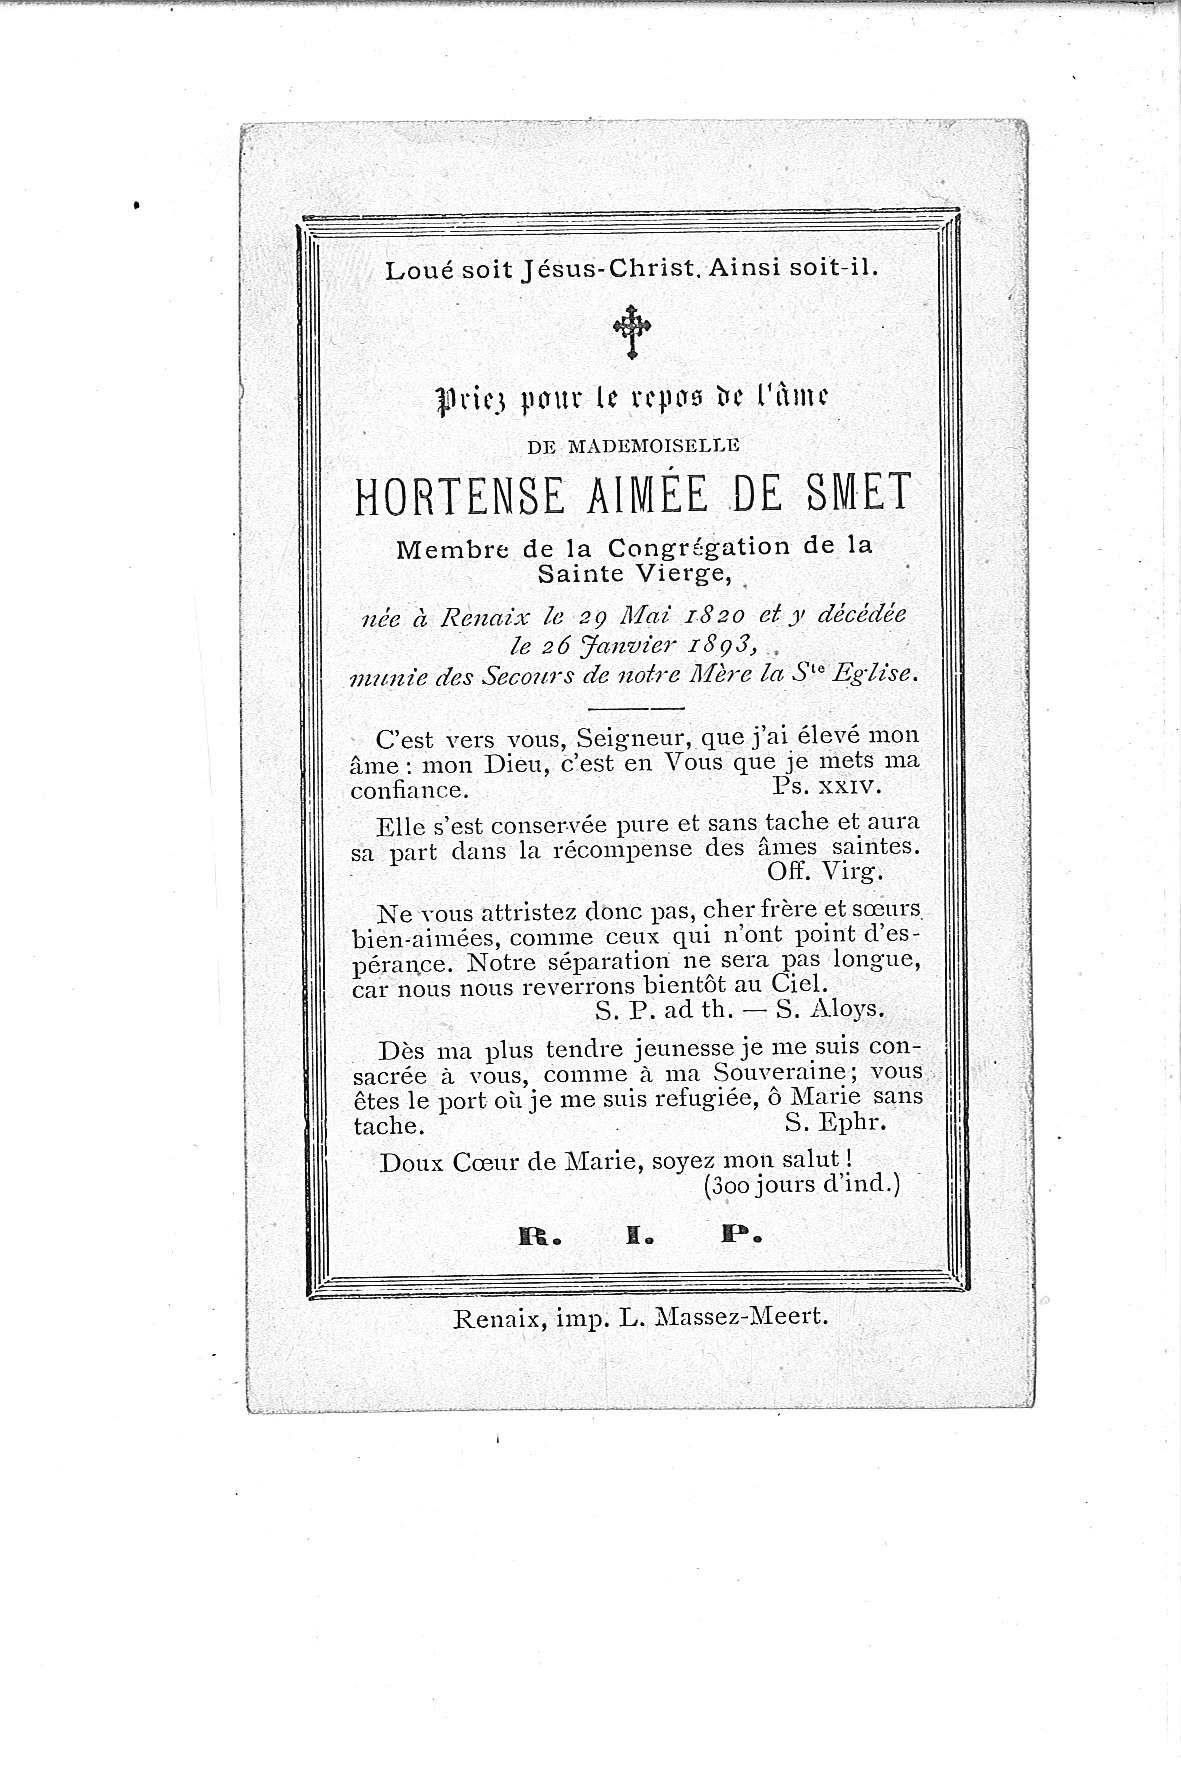 Hortense Aimée (1893) 20120502165716_00094.jpg